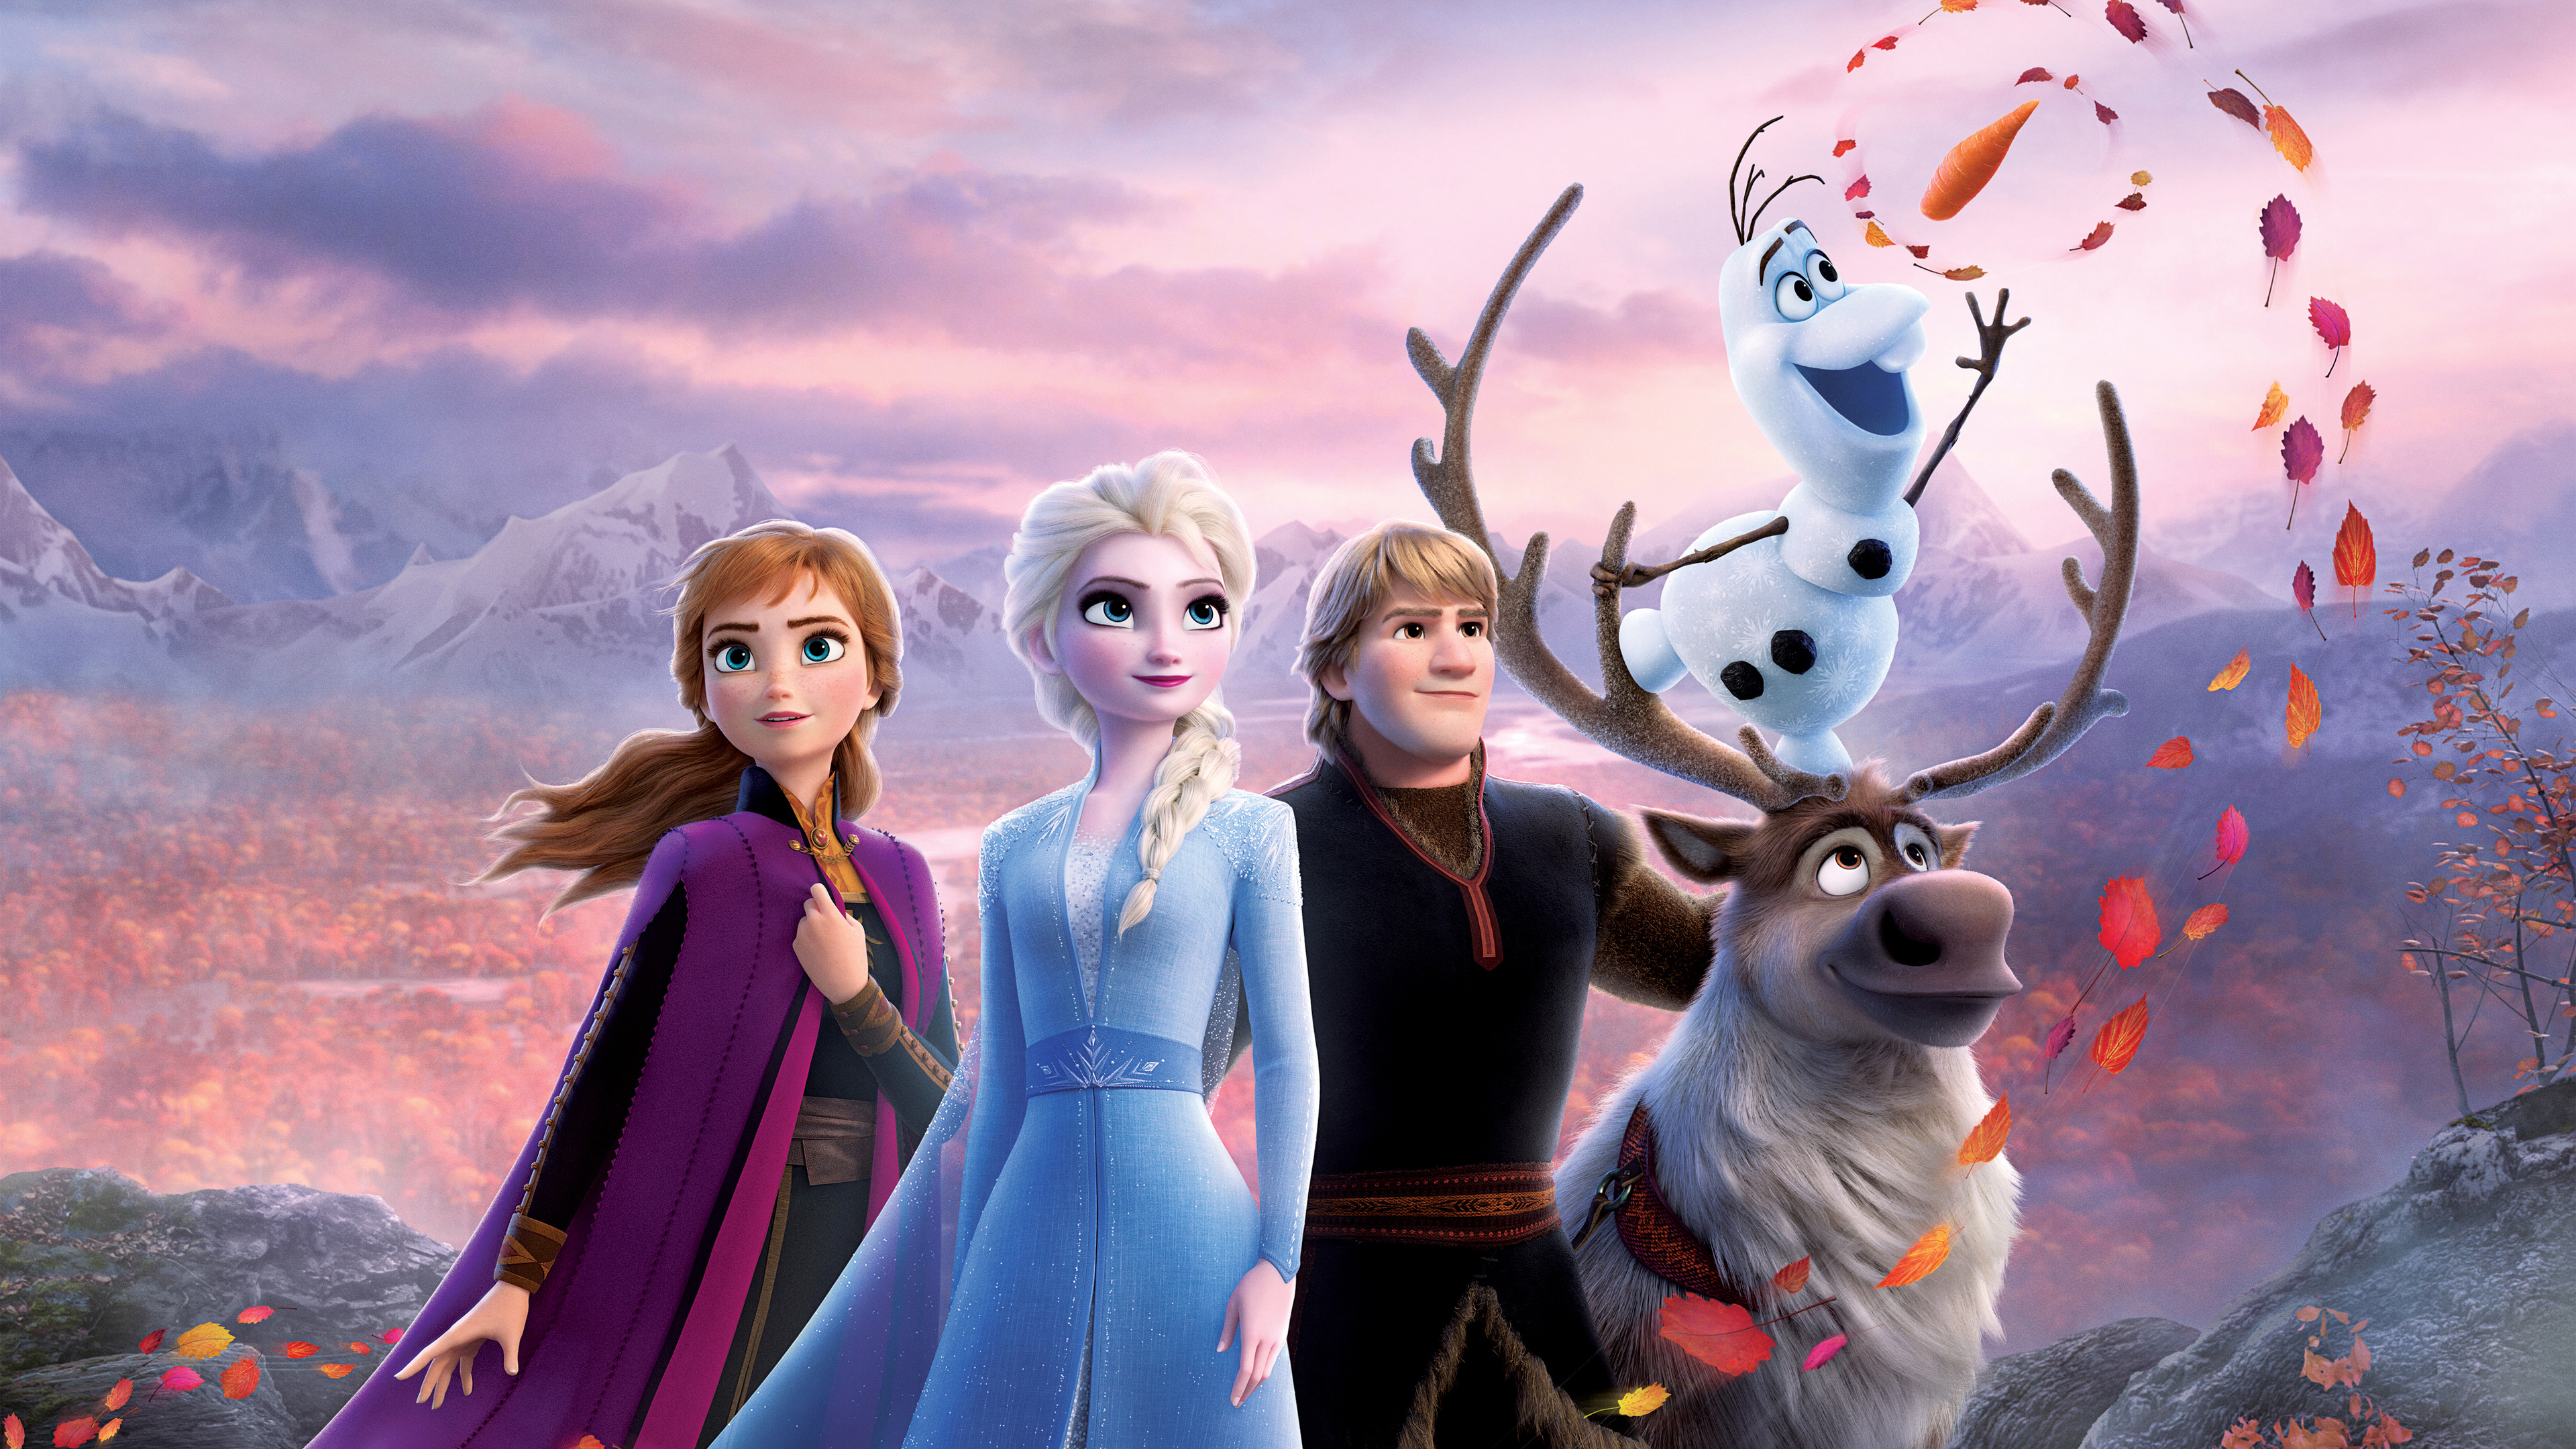 frozen 2 2019 movie 1572371024 - Frozen 2 2019 Movie - movies wallpapers, hd-wallpapers, frozen 2 wallpapers, disney wallpapers, 5k wallpapers, 4k-wallpapers, 2019 movies wallpapers